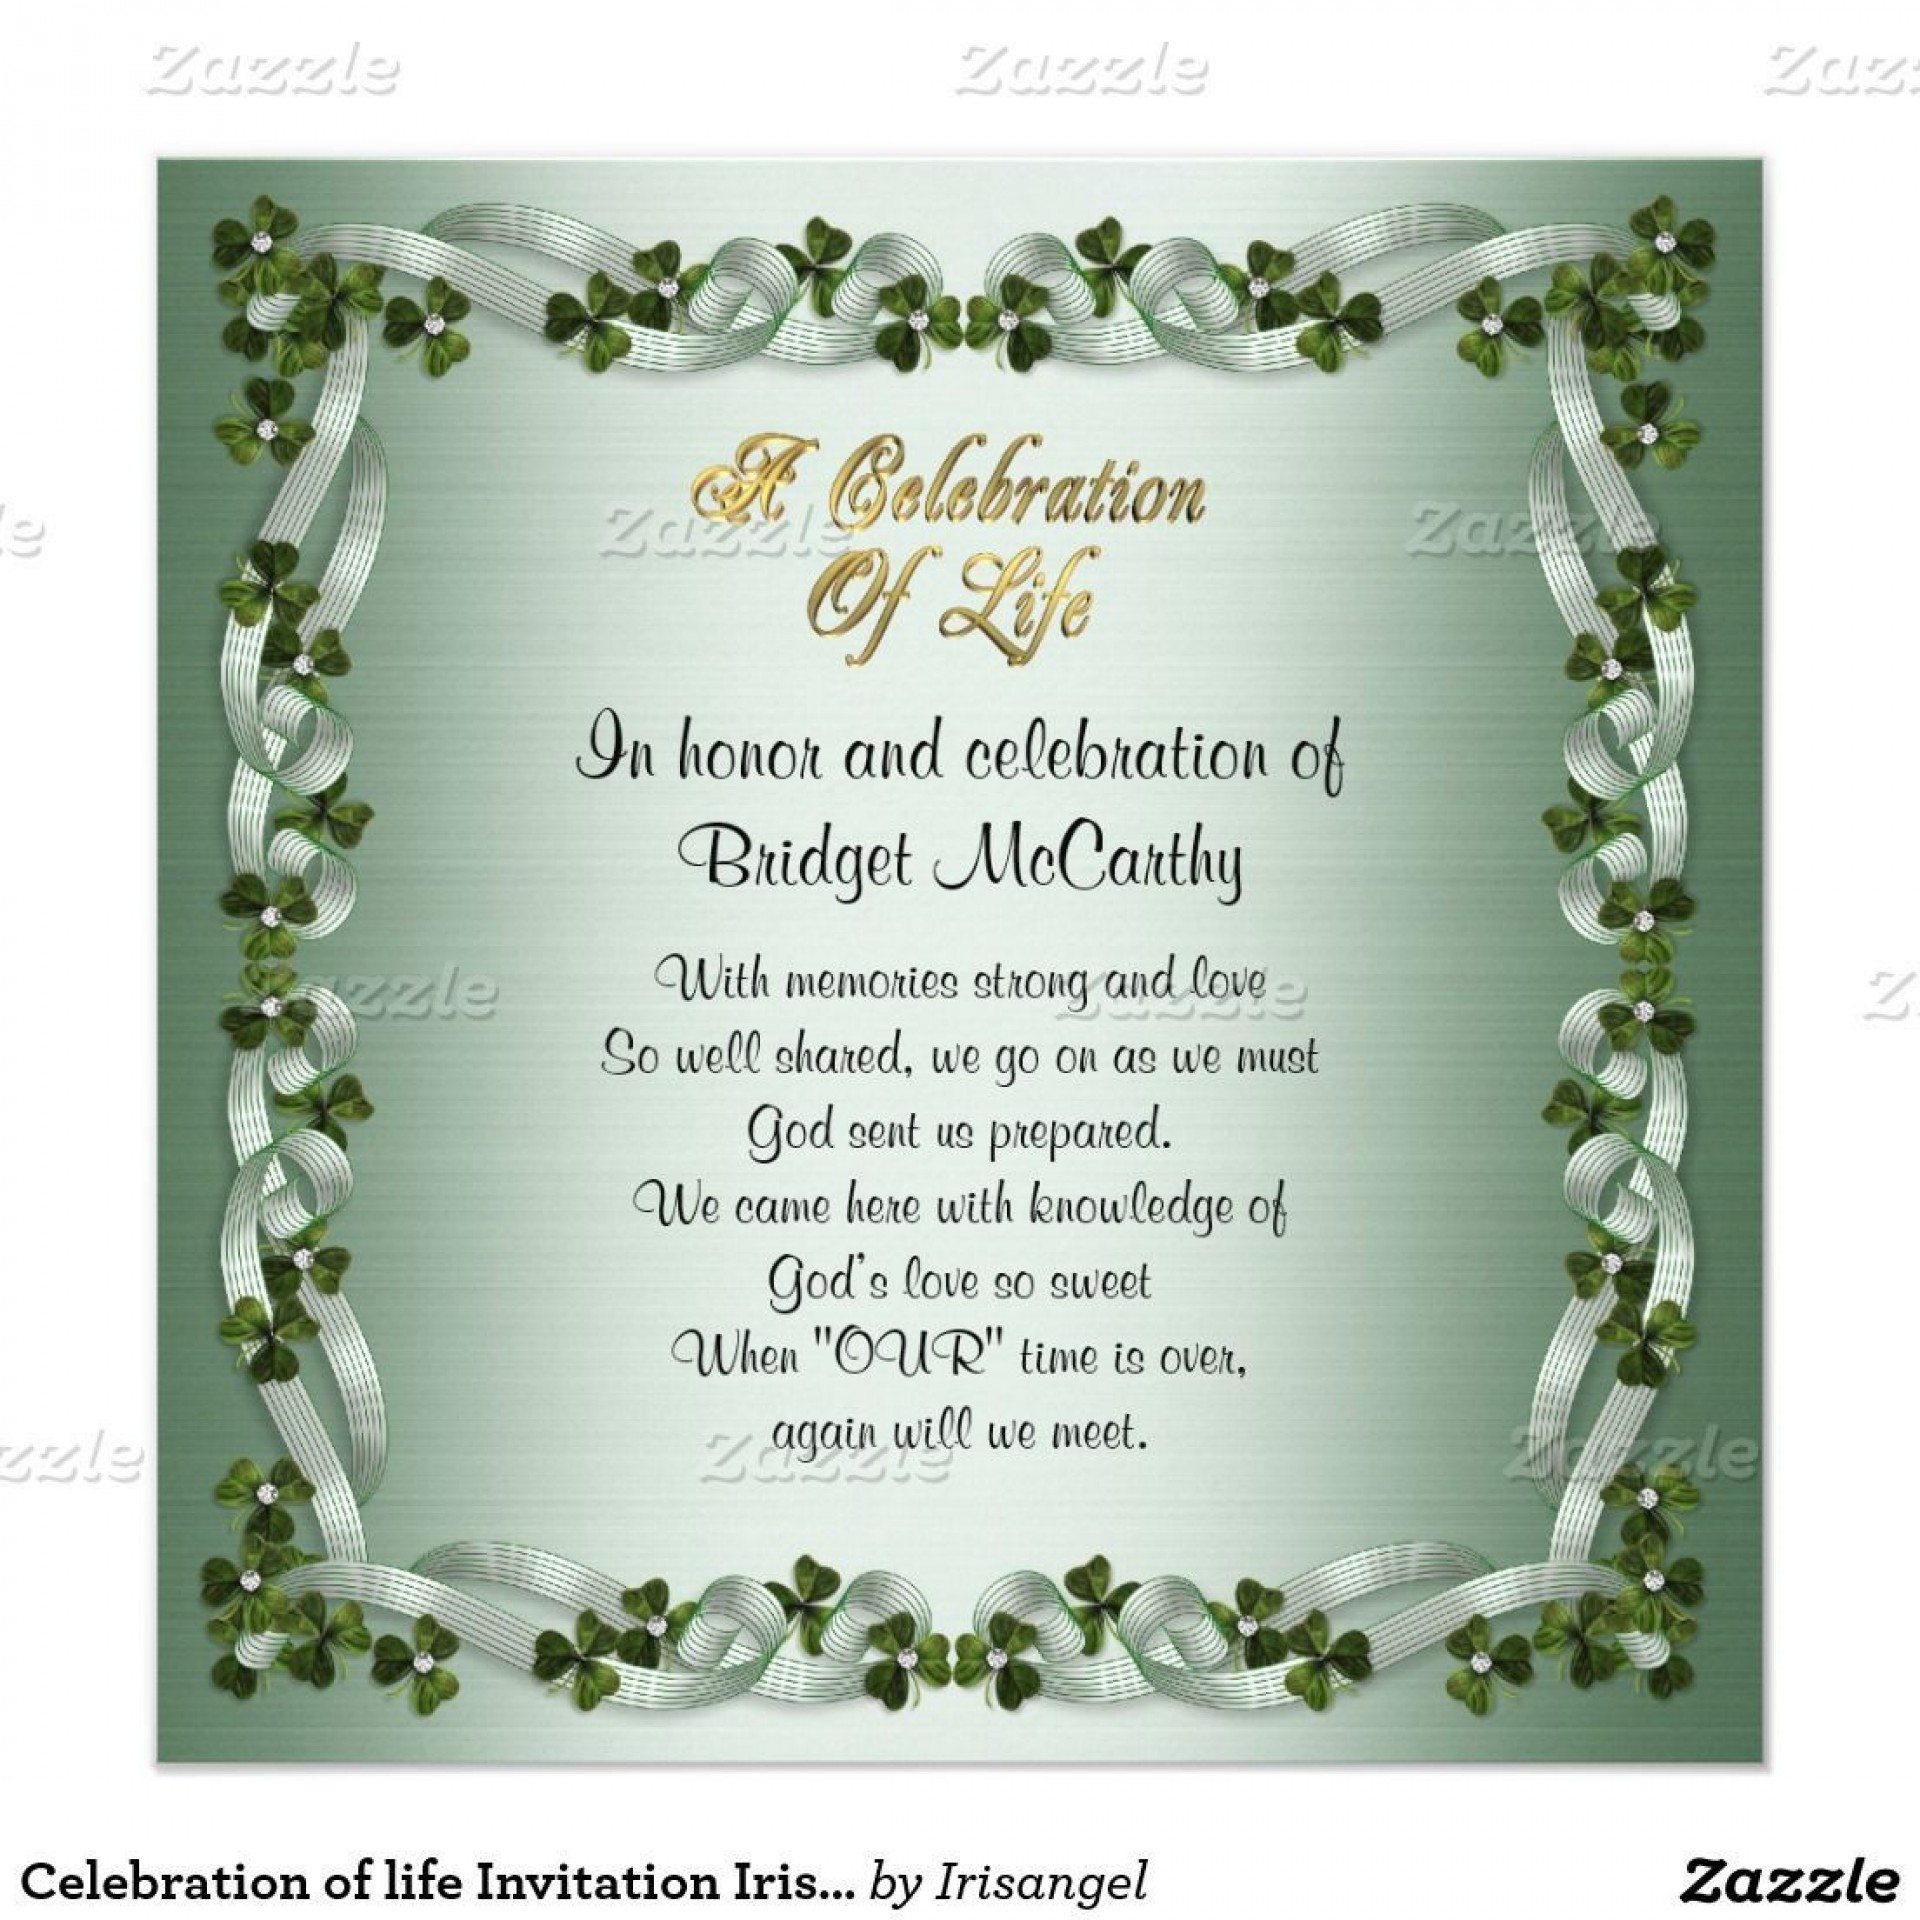 001 Amazing Celebration Of Life Invitation Template Free Highest Quality 1920